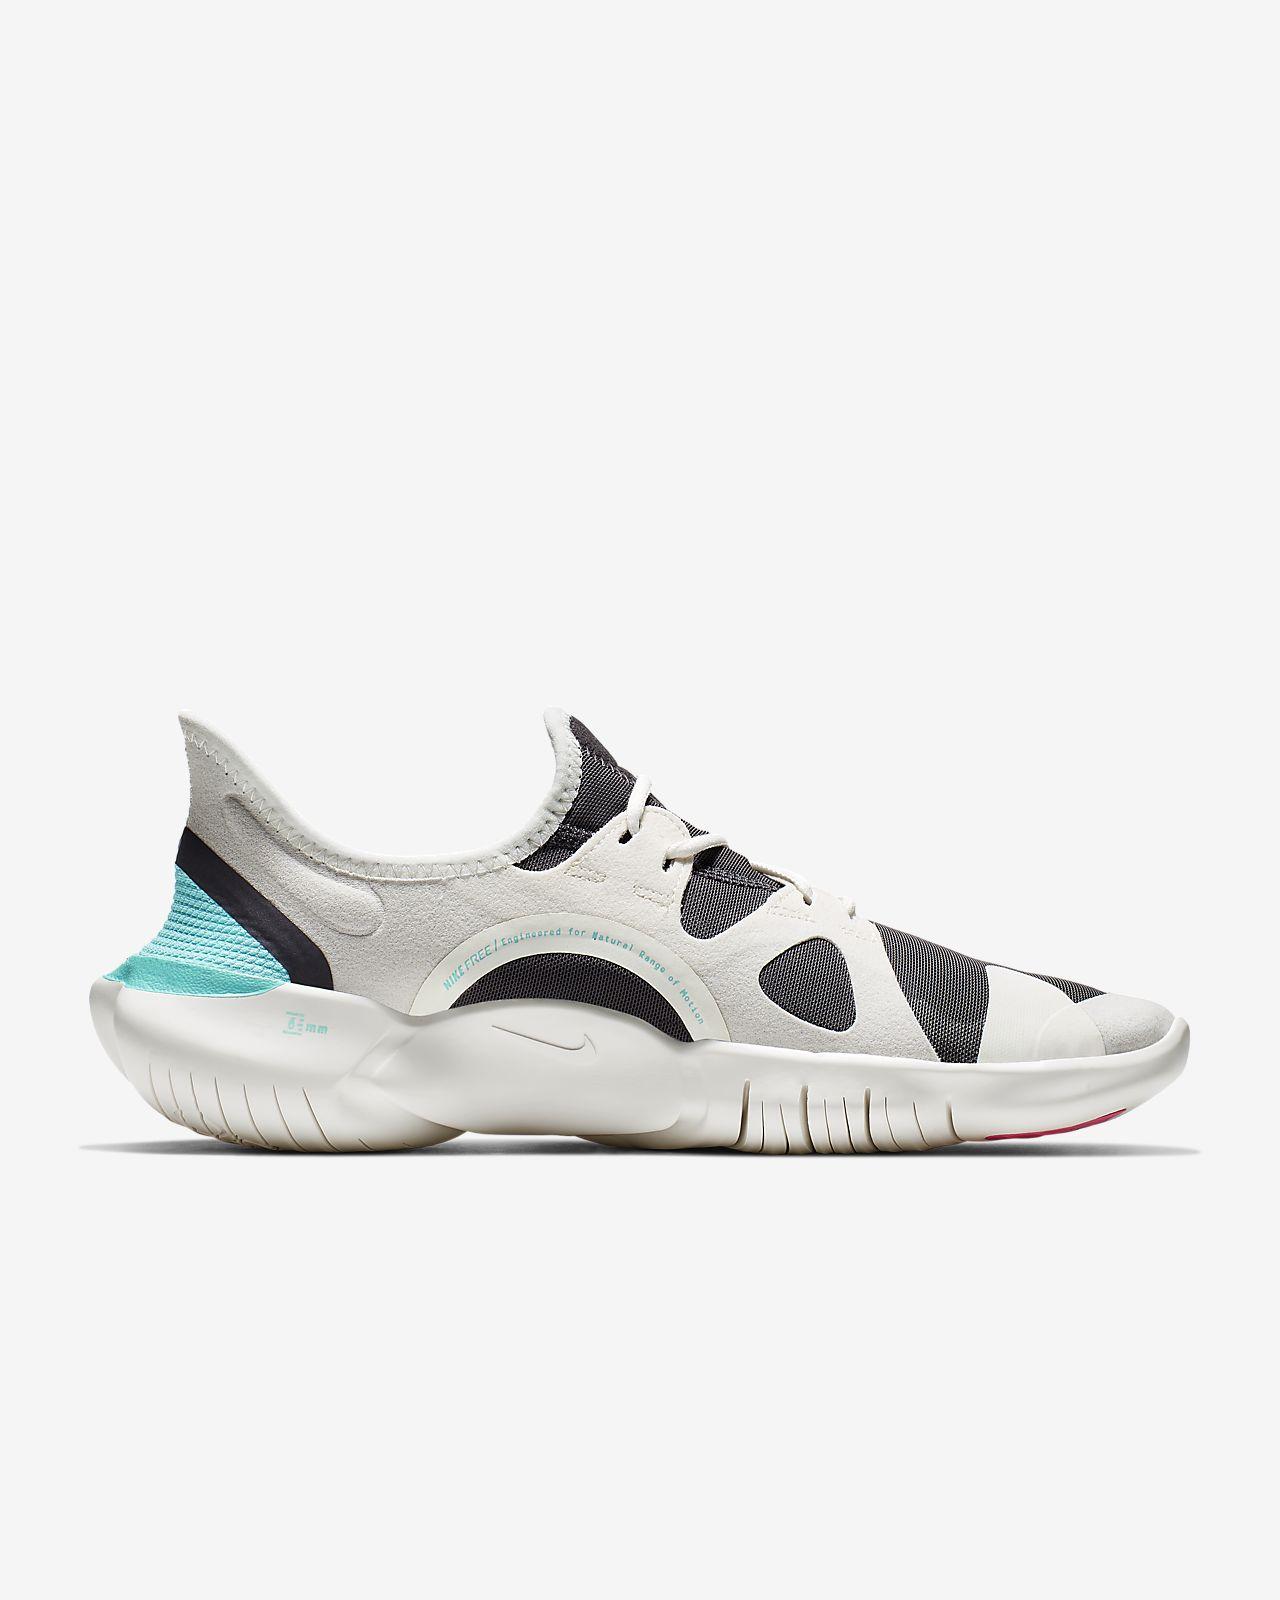 meilleur pas cher 105e1 c5a0e Chaussure de running Nike Free RN 5.0 pour Femme